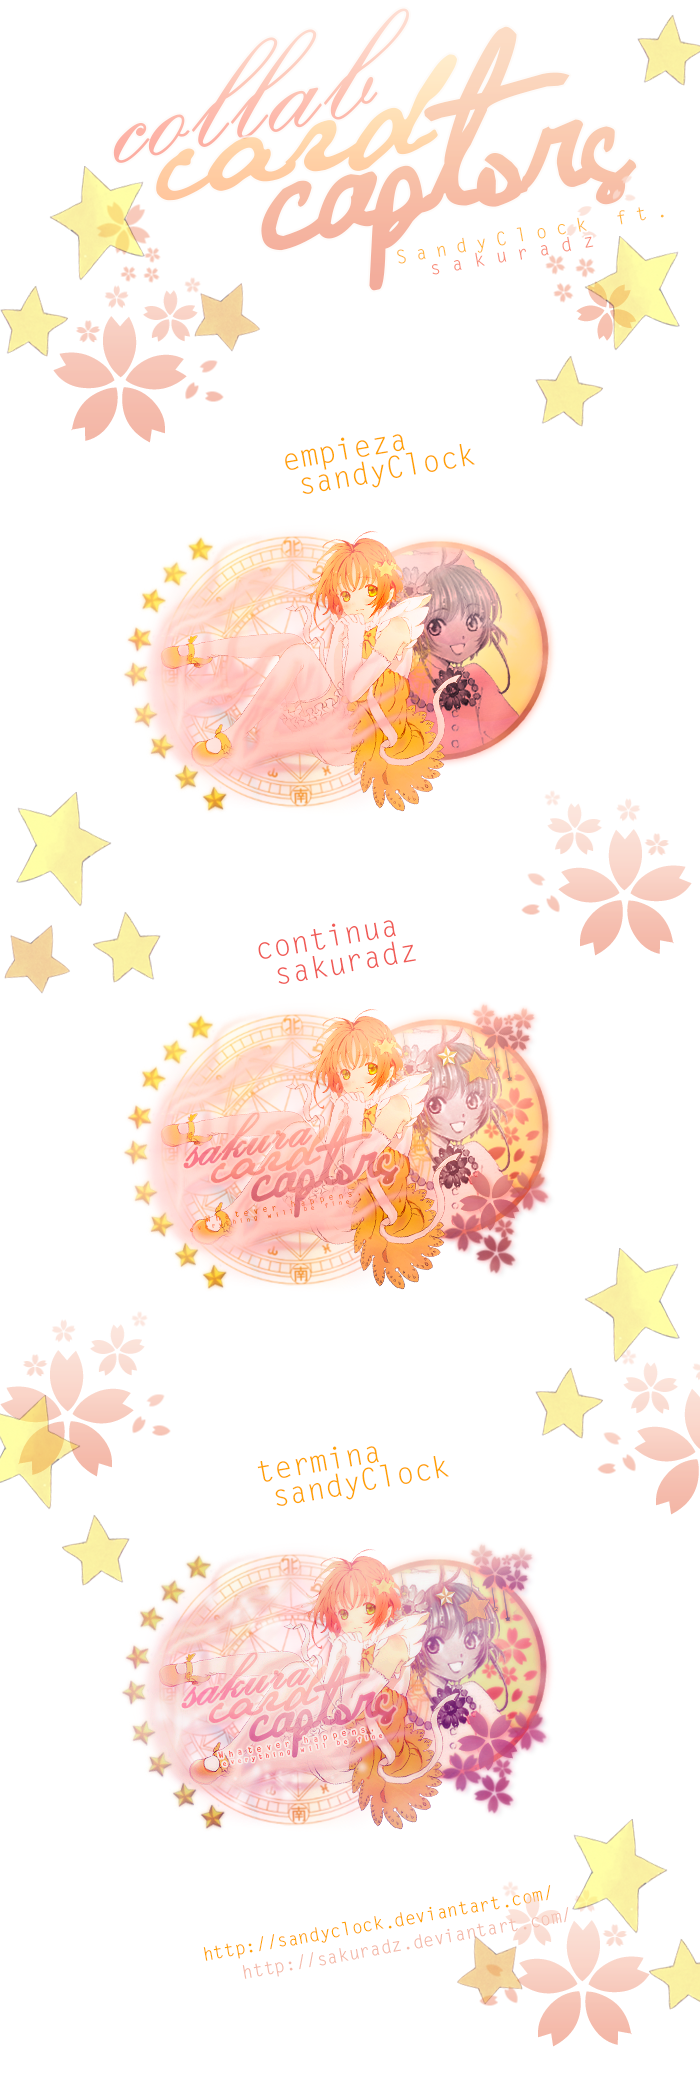 Collab   SAKURA CARD CAPTOR   by SakuraDz